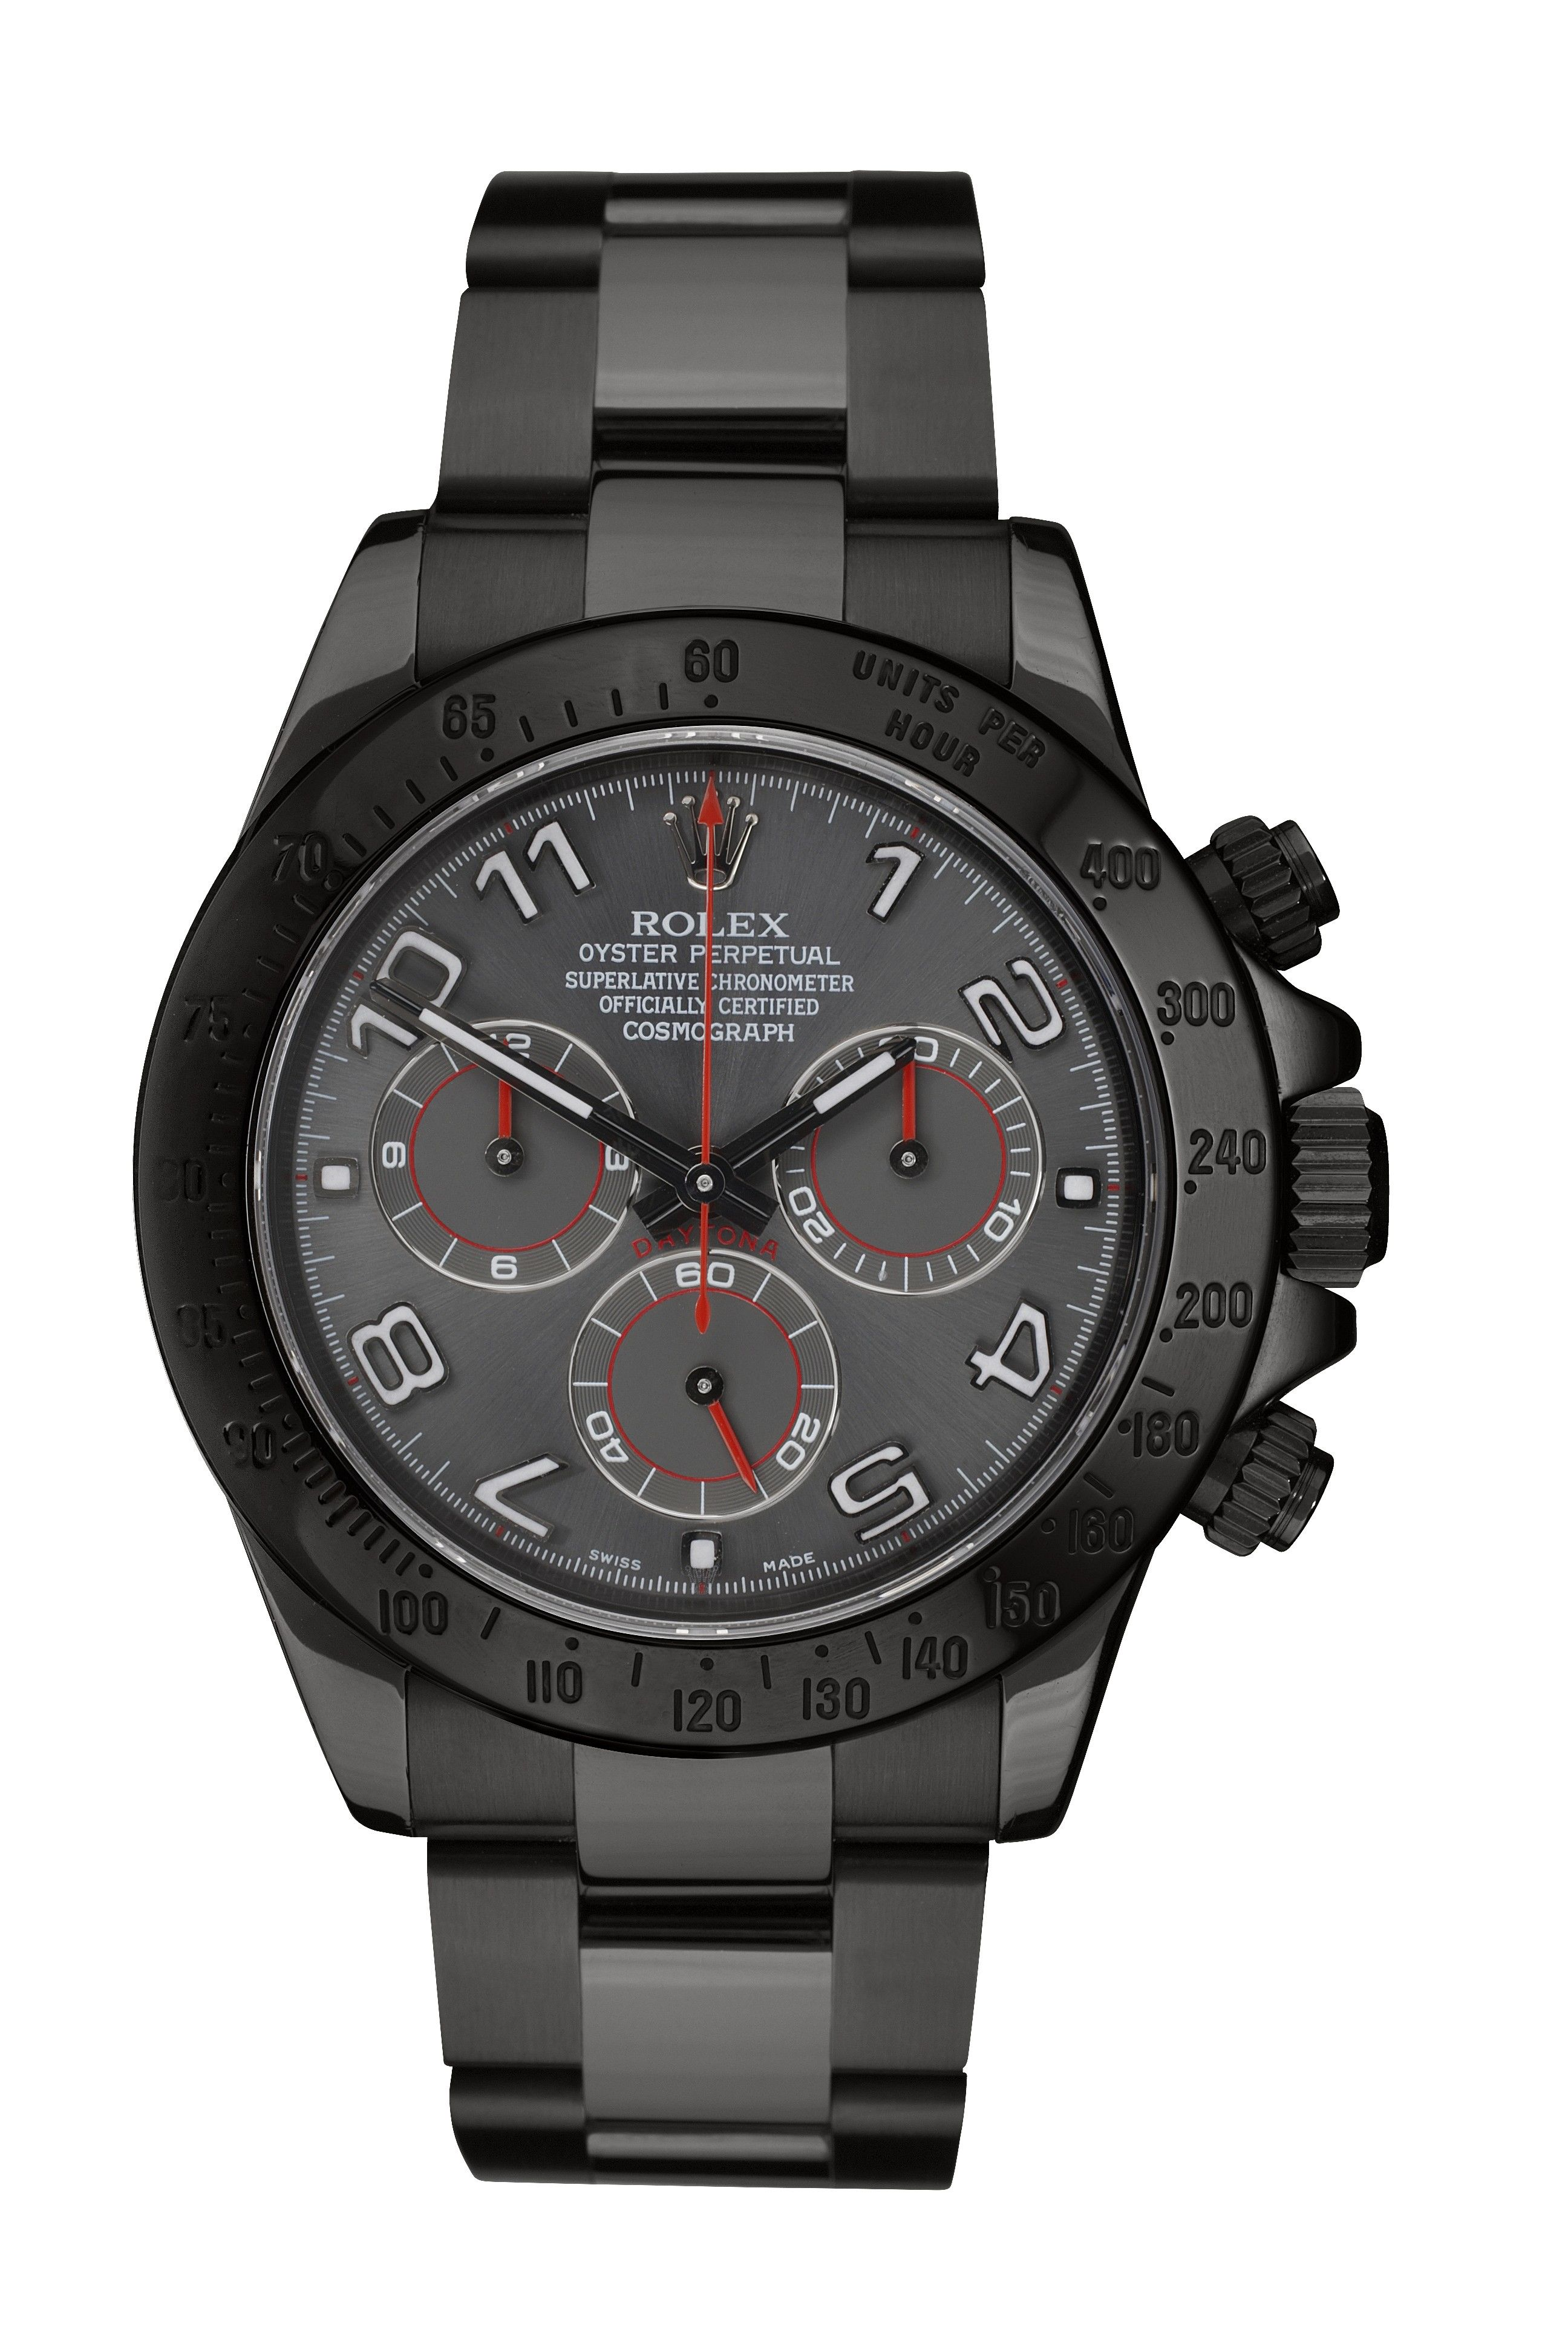 d9677d70f12 TITAN BLACK ROLEX DAYTONA (APOLLO)